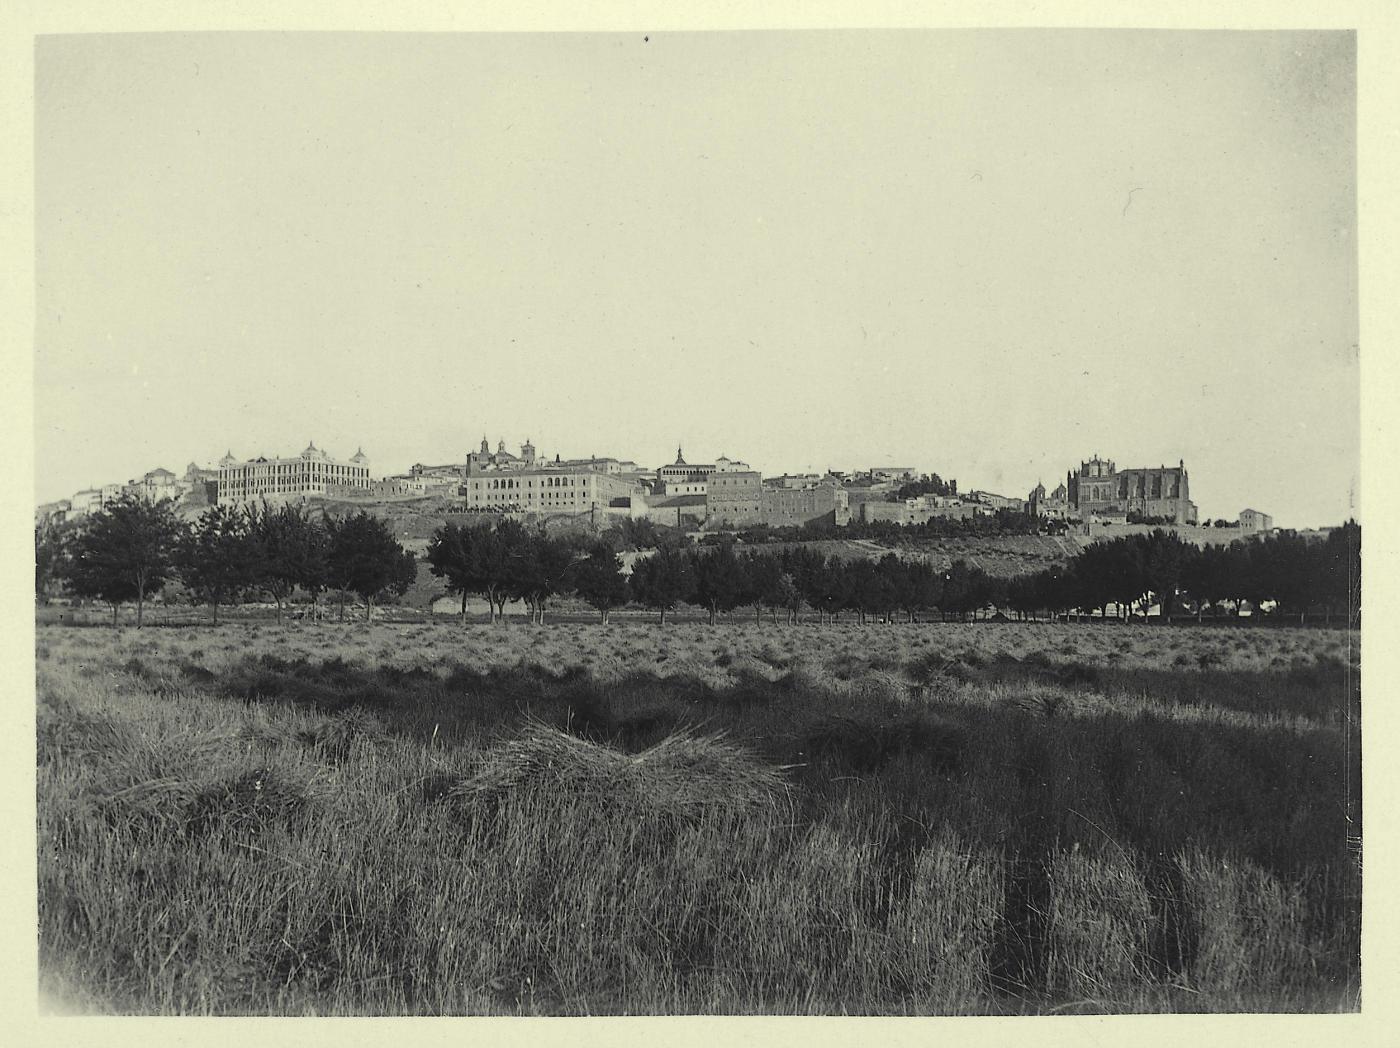 d.-Vista de la ciudad desde la Vega Baja